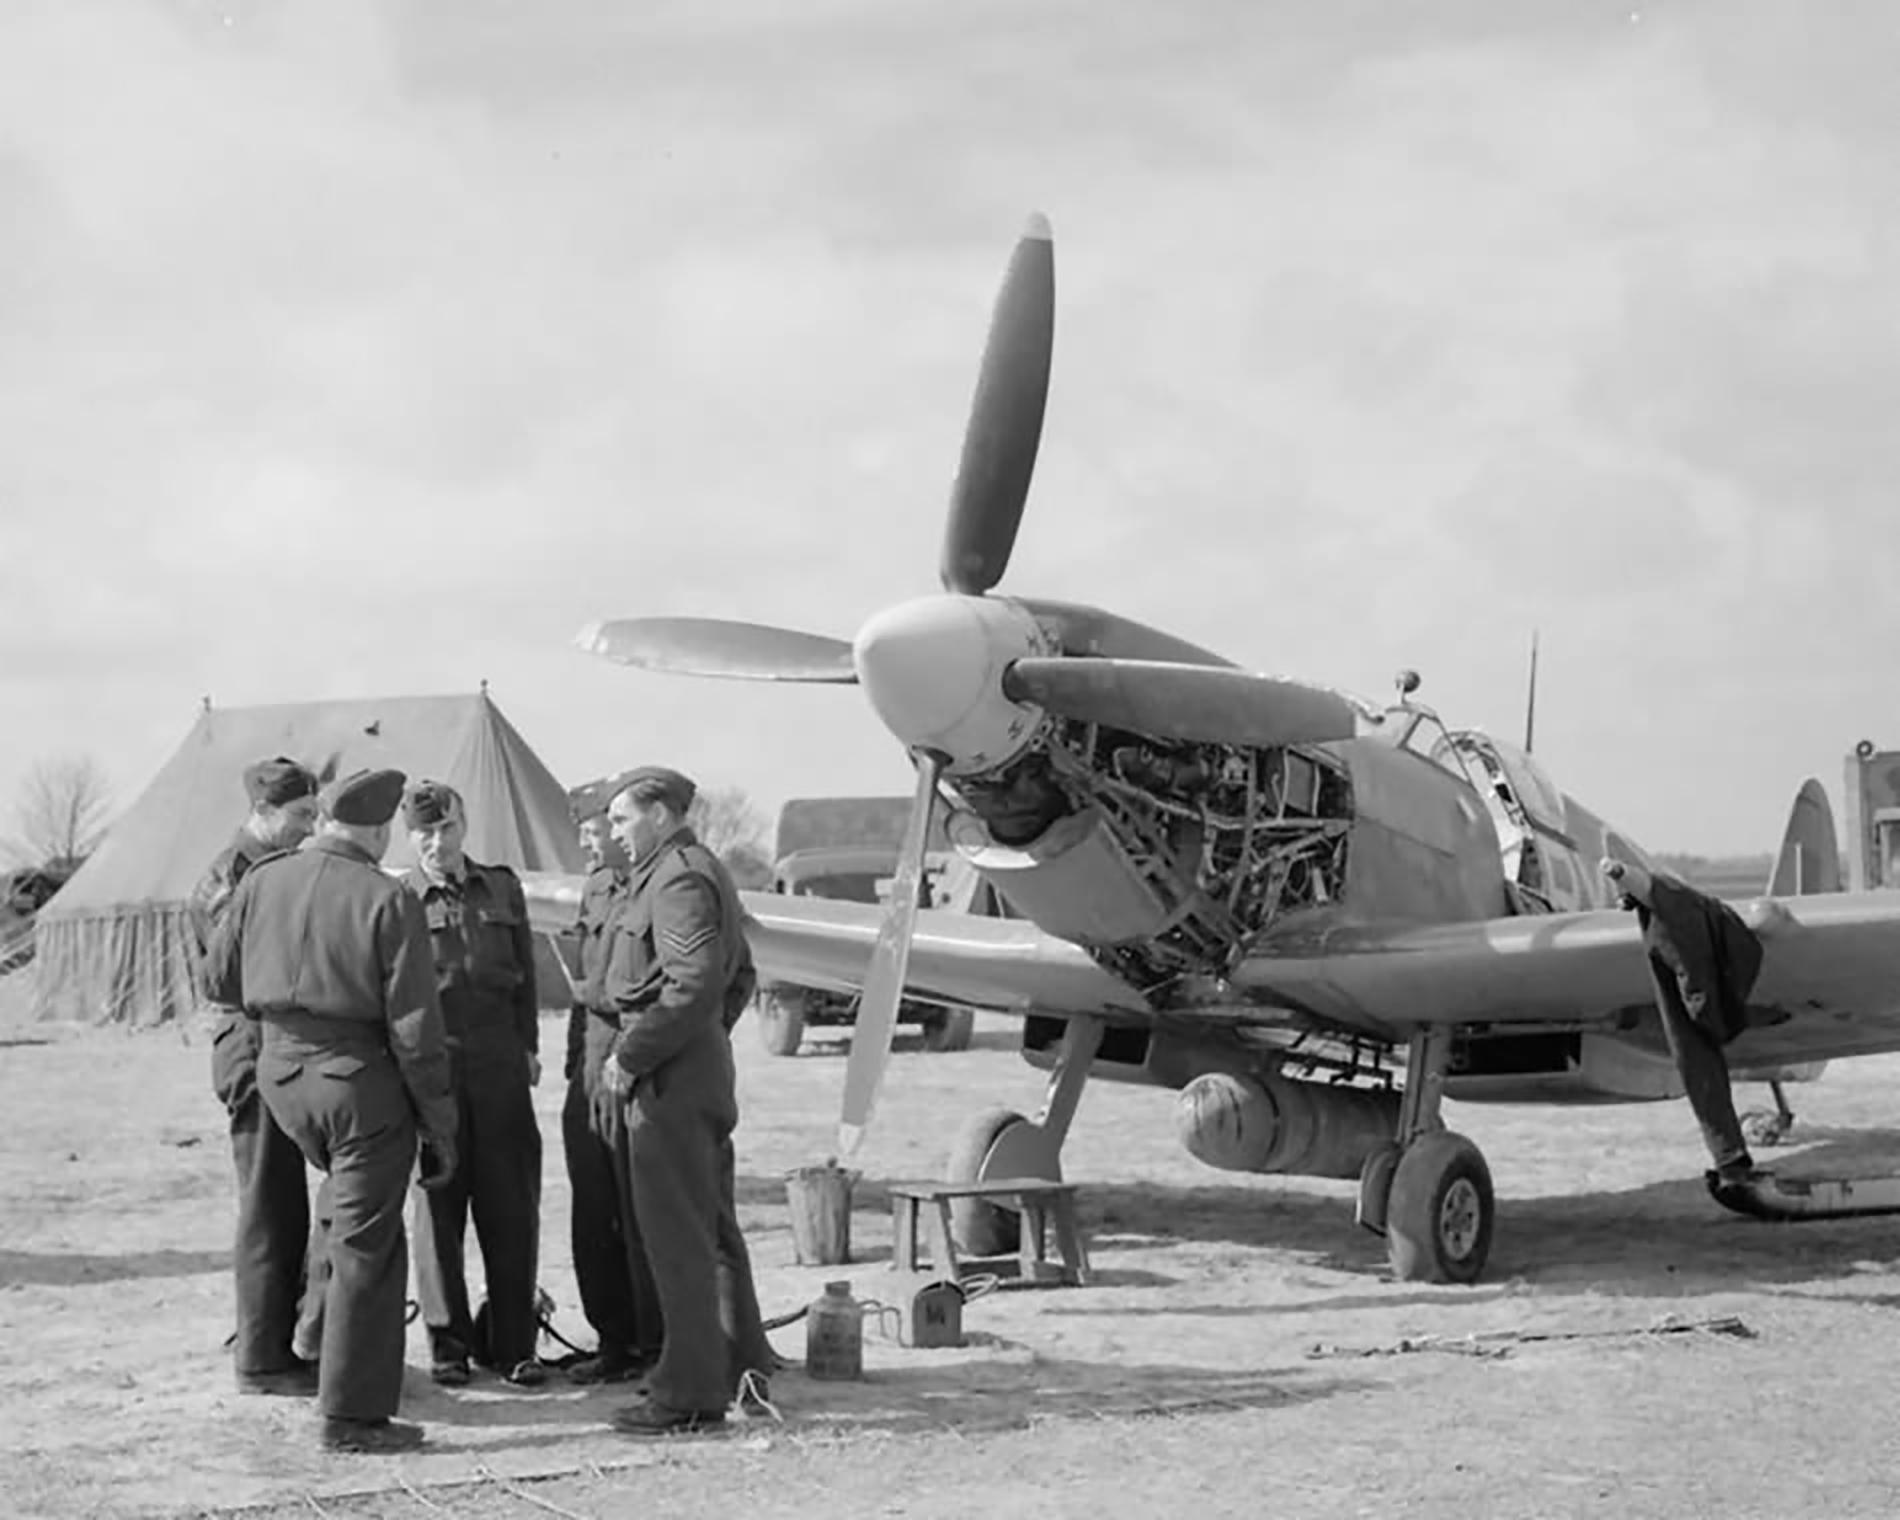 Spitfire LFIX RAF 313Sqn RY undergoing an oil change at Appledram Sussex 1944 web 01